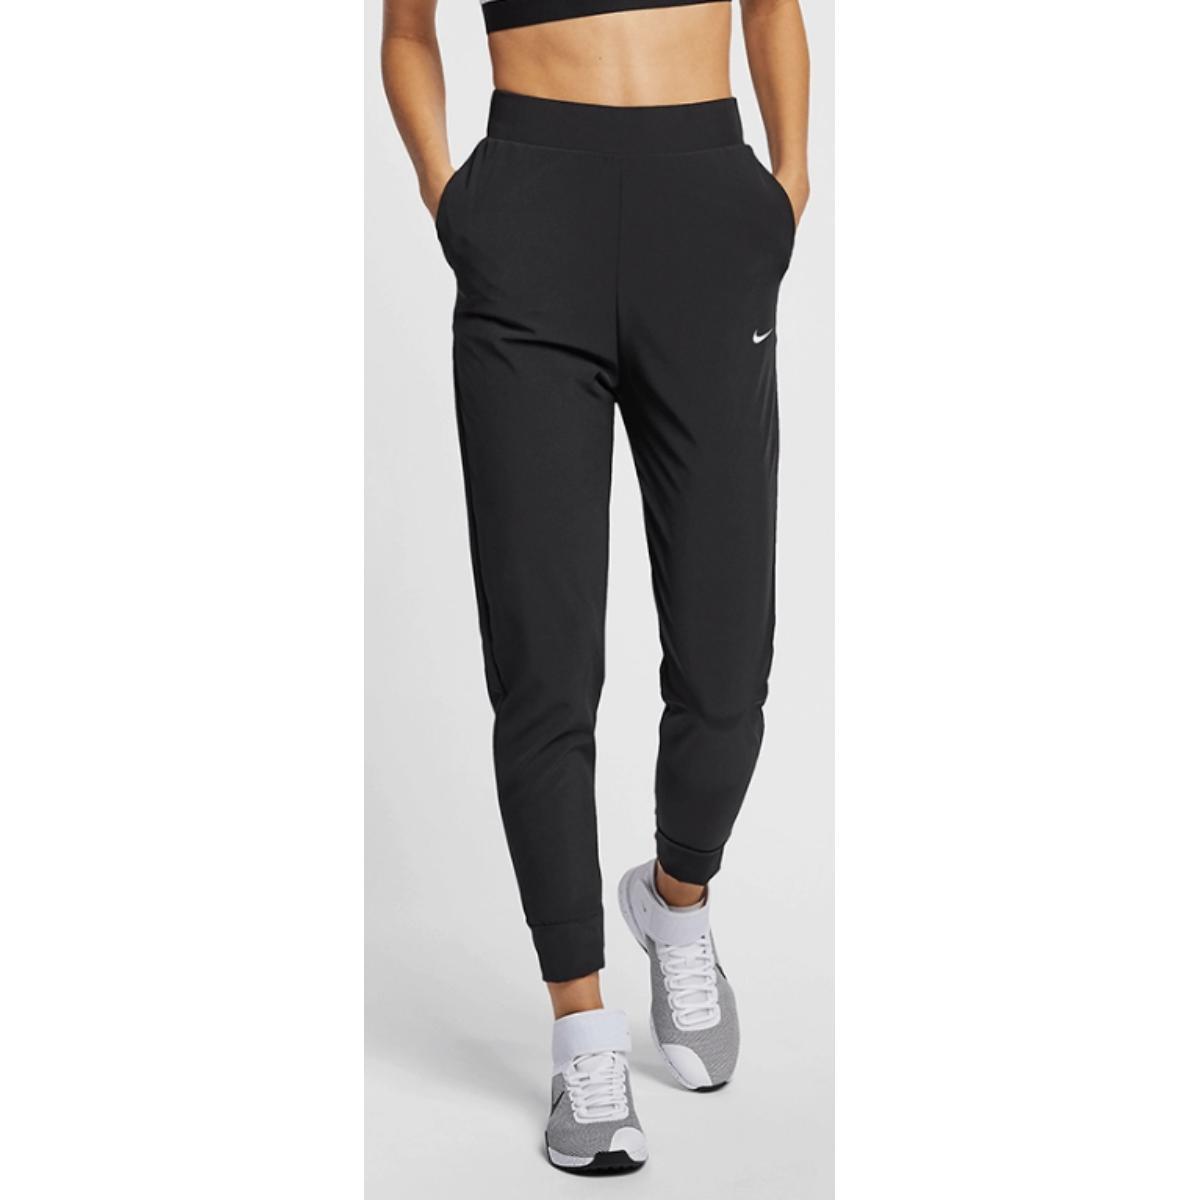 Calça Feminina Nike Aq0296-010 Bliss Victory Preto